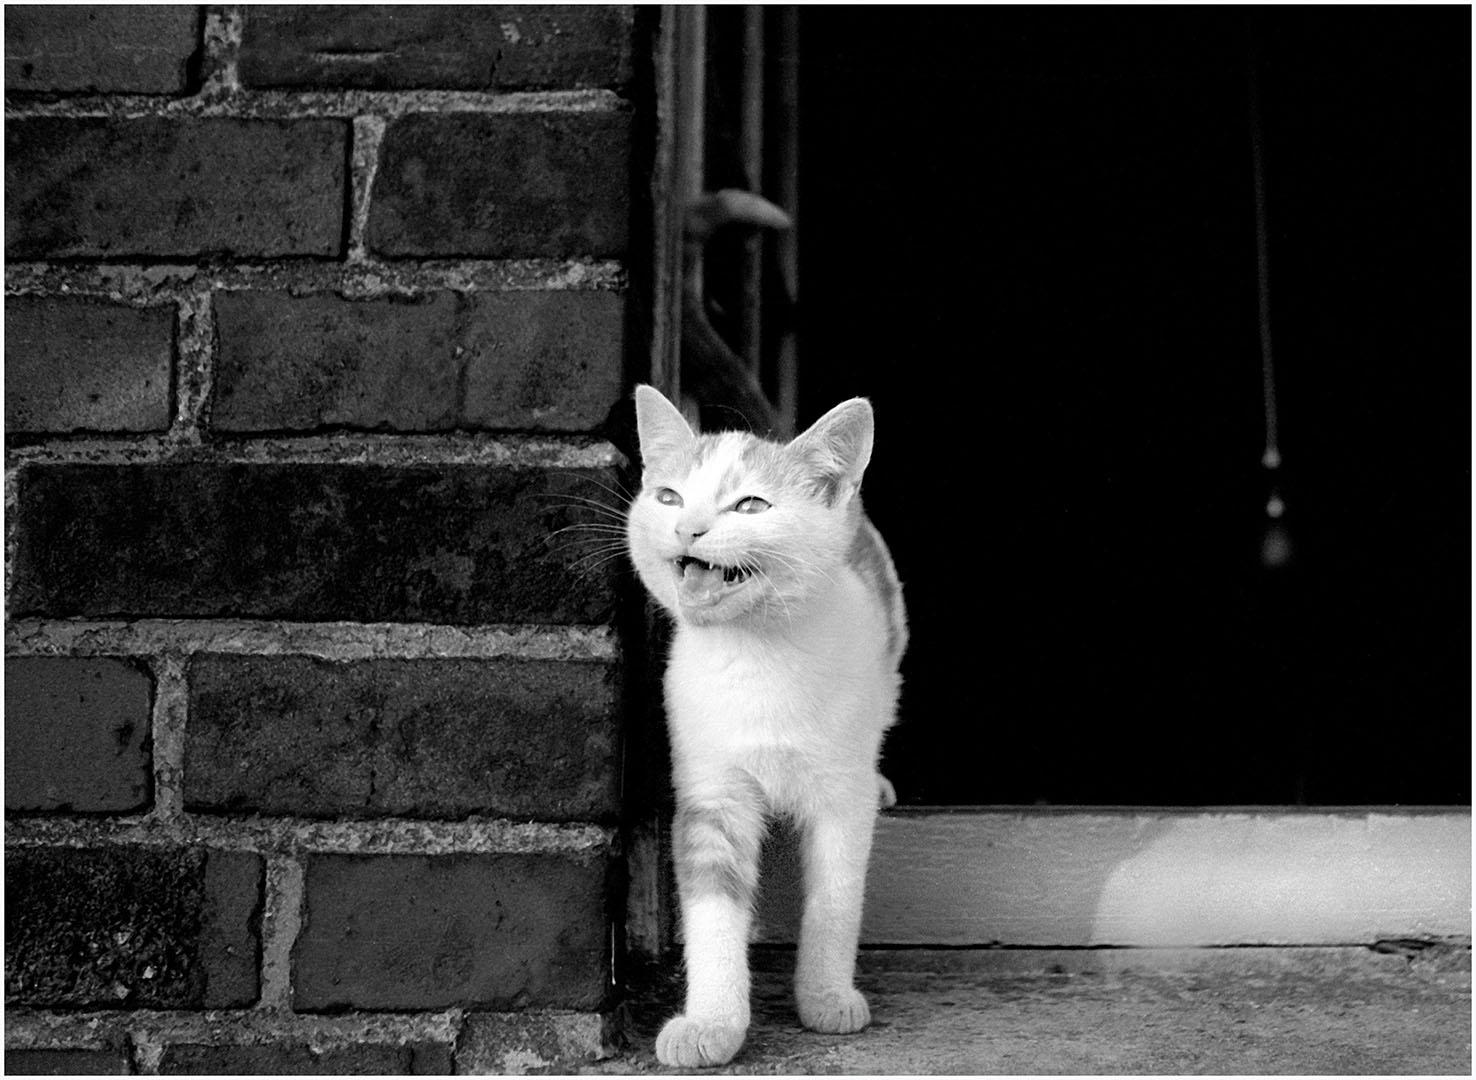 Lazy_Cats_033_K1.78